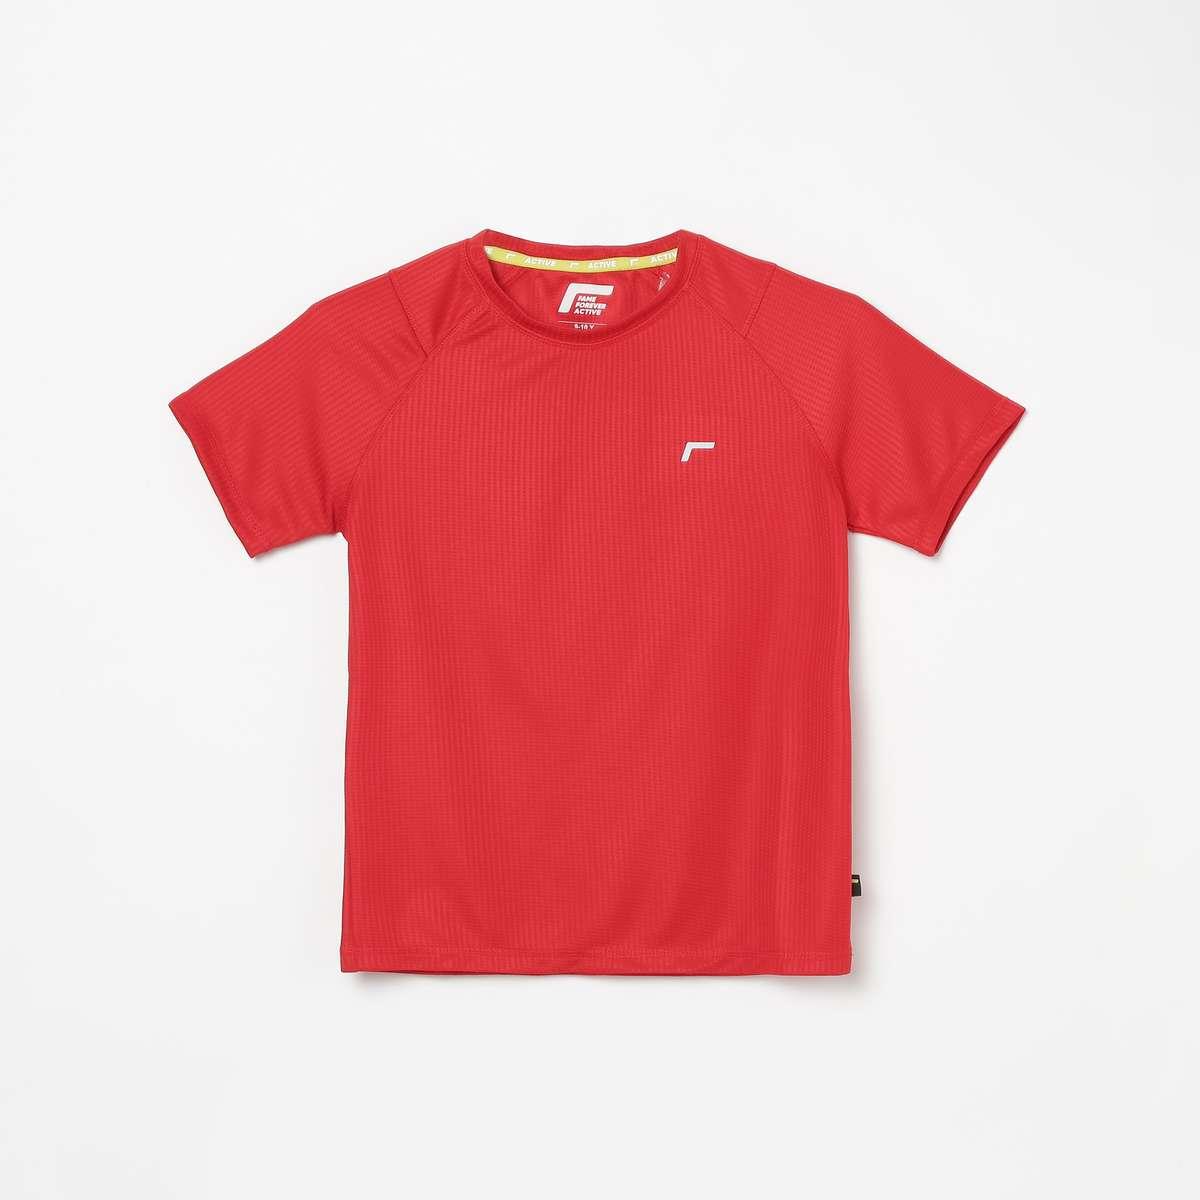 1.FAME ACTIVE Boys Textured Crew Neck T-shirt